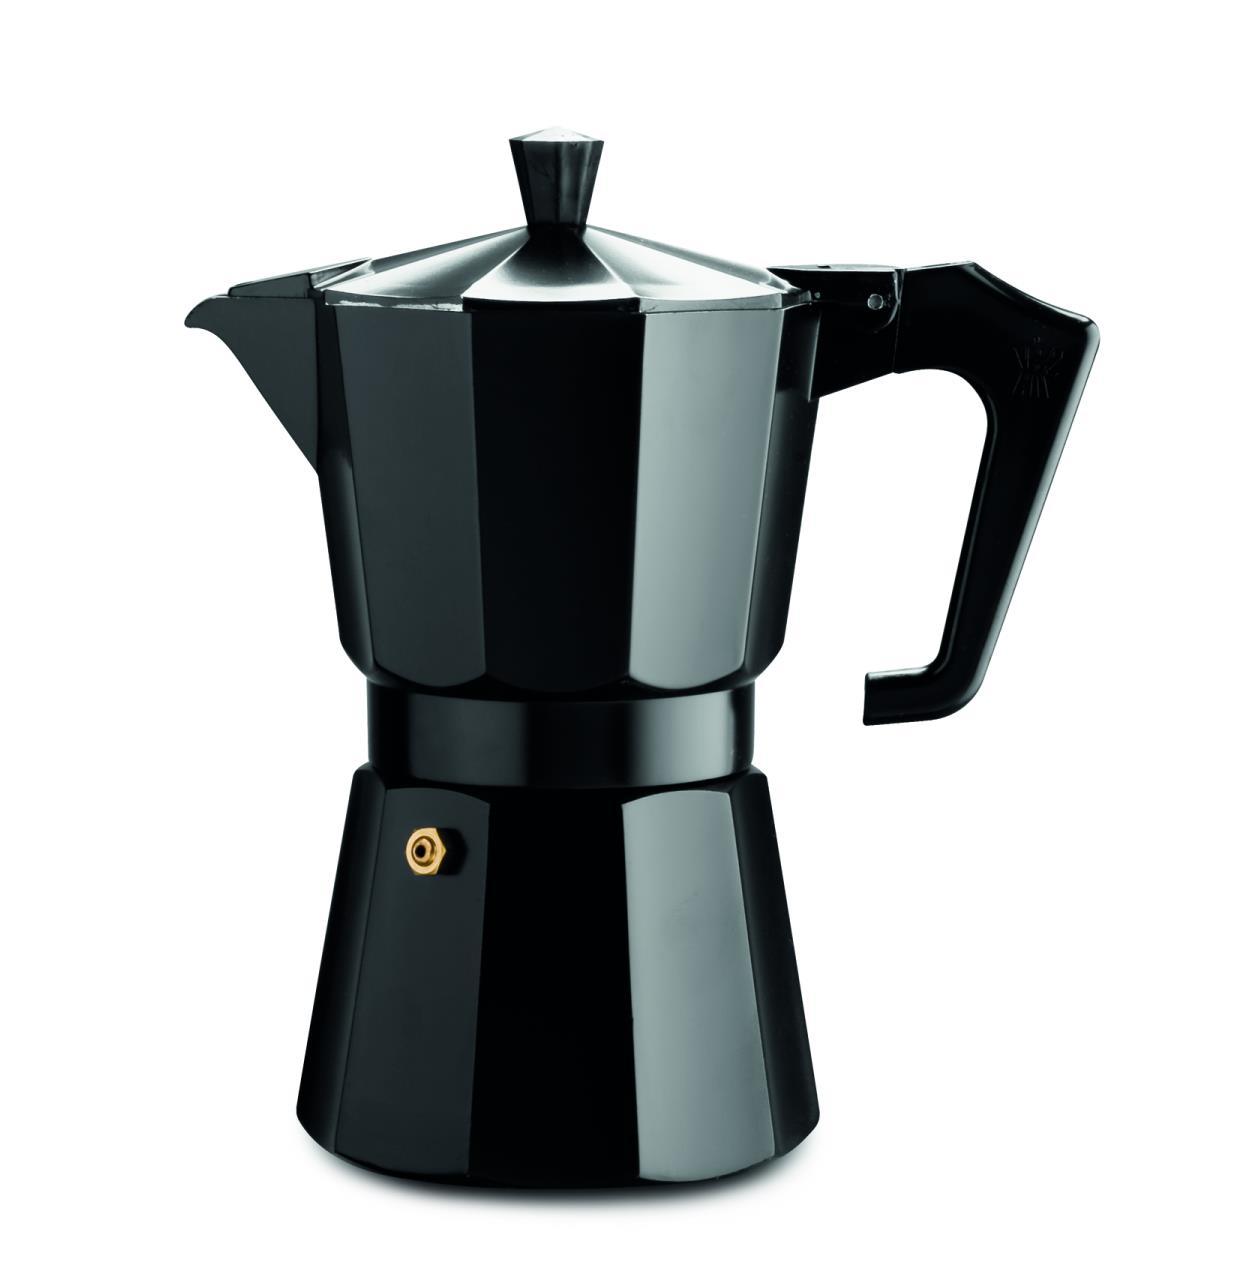 Pezzetti Black Italexpress Aluminium Coffee Maker 6C Kerr Cowan